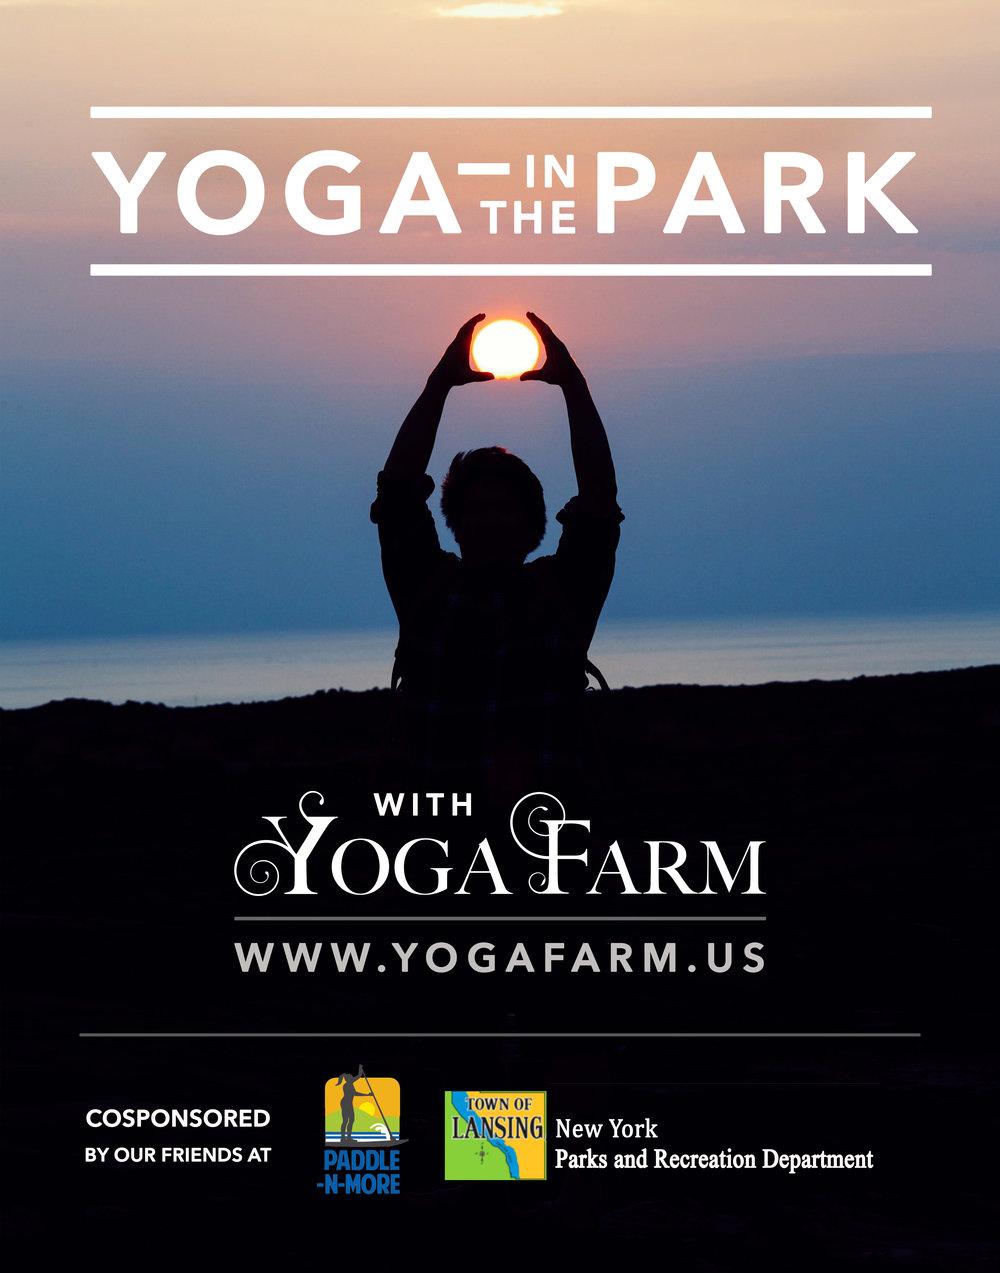 YF_YogainthePark_Sign_1.jpg